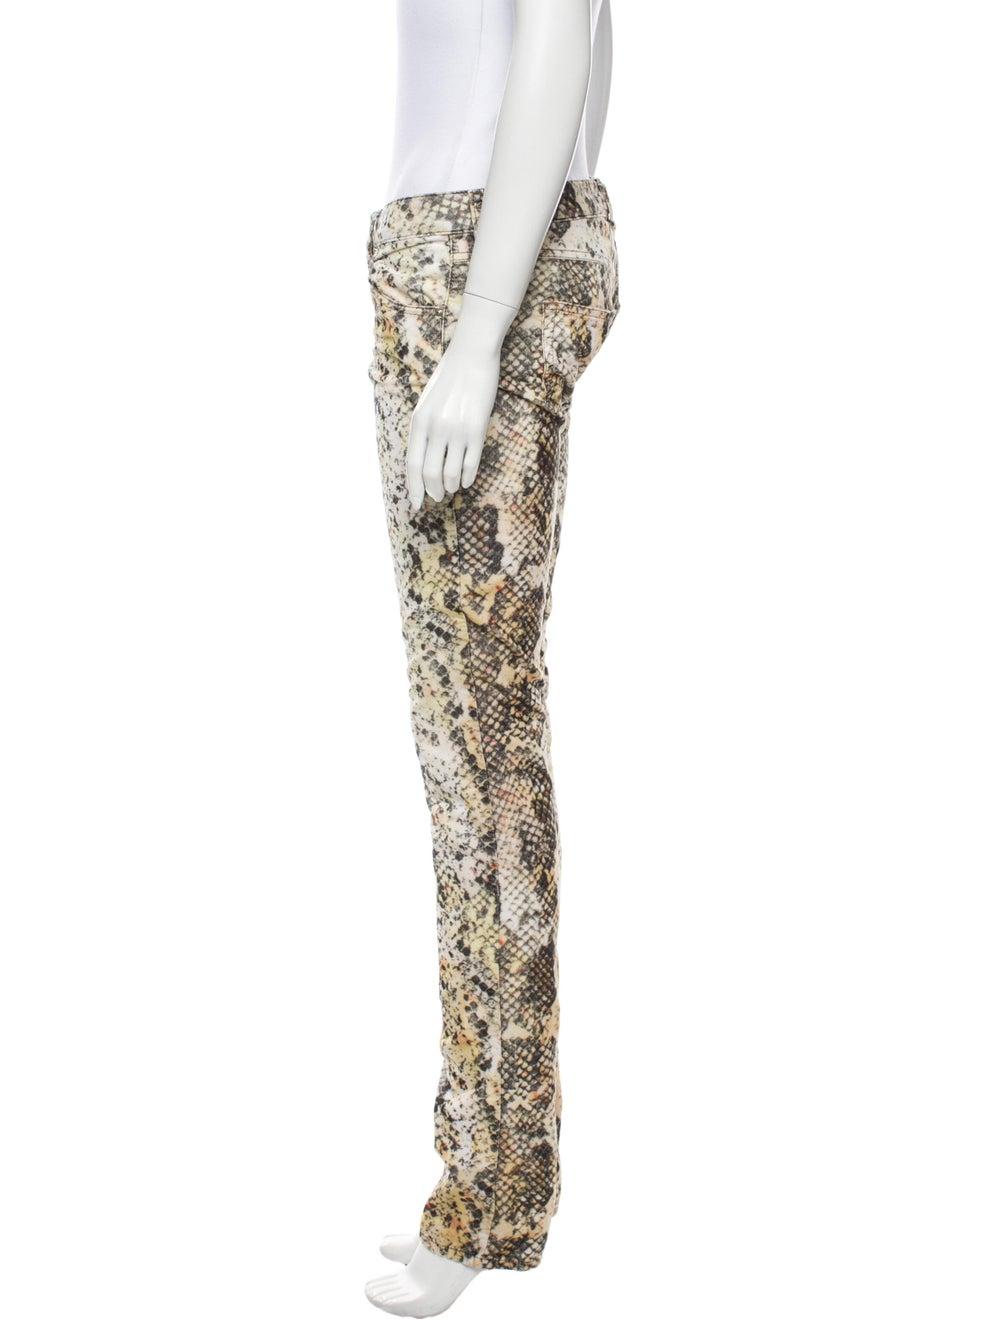 Isabel Marant Animal Print Straight Leg Pants - image 2